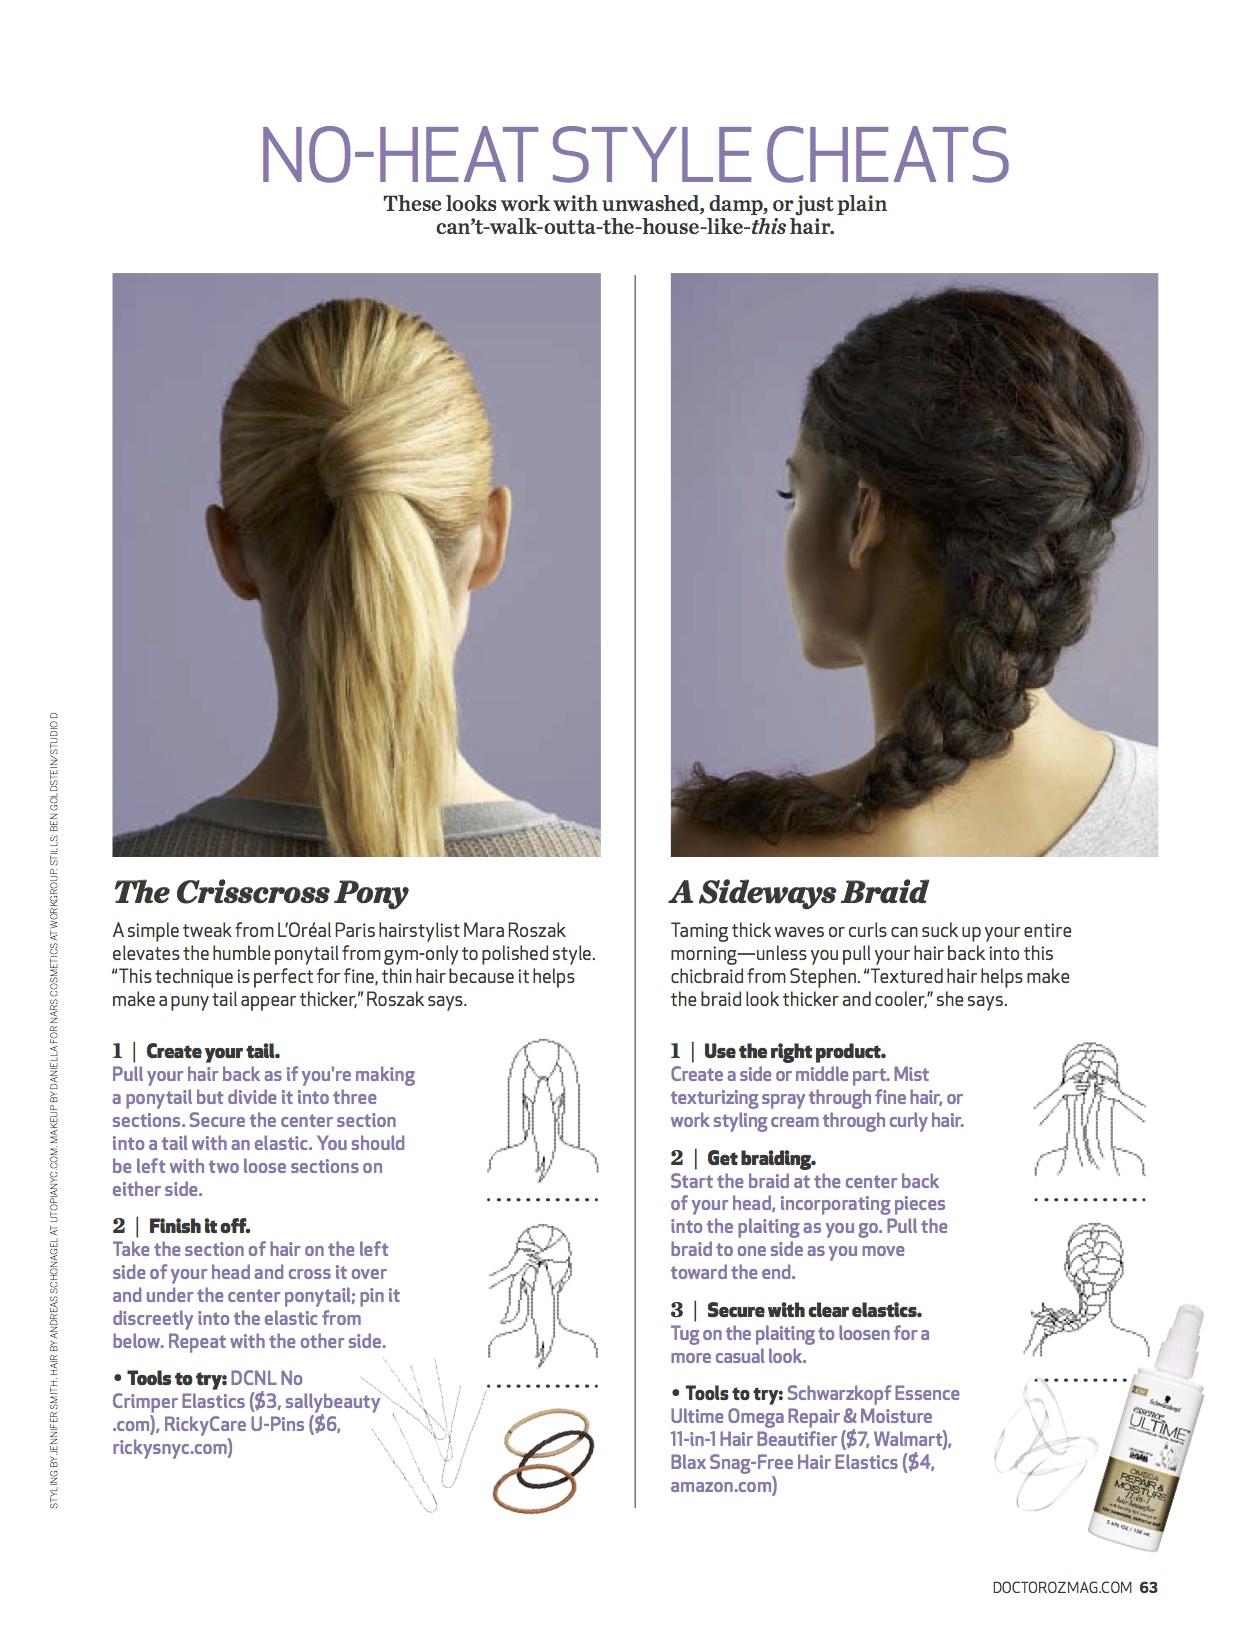 oz hair clip copy 6.jpg